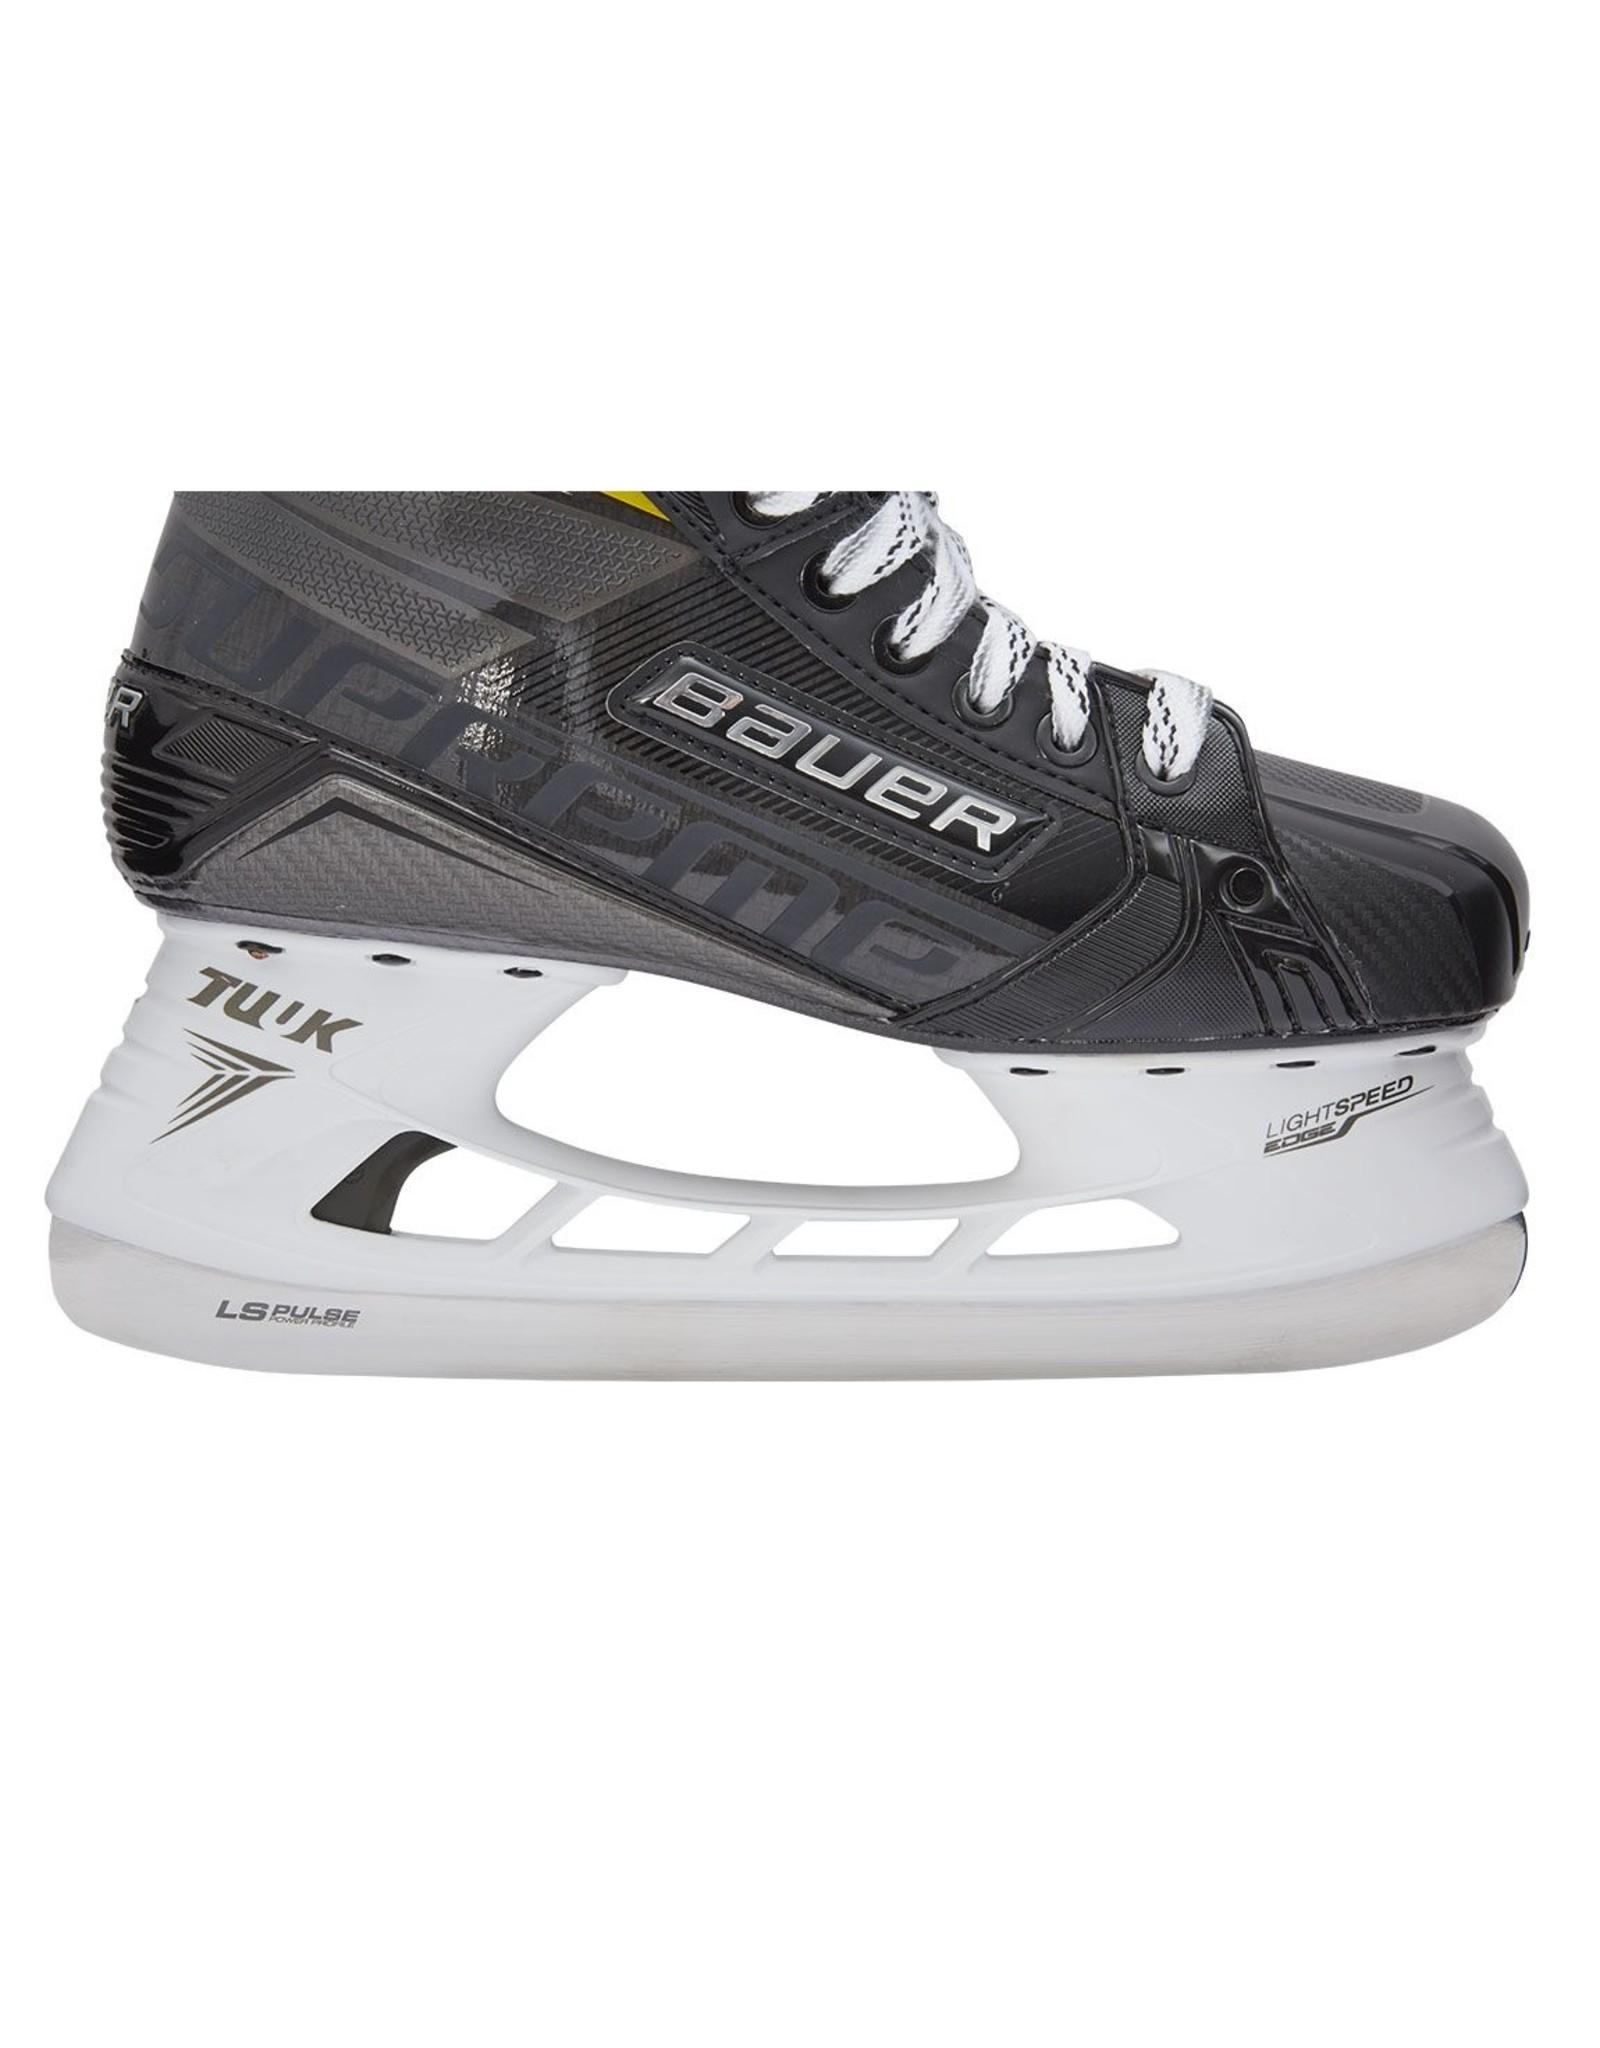 Bauer Hockey - Canada BAUER BTH20 SUPREME 3S PRO SKATE INT